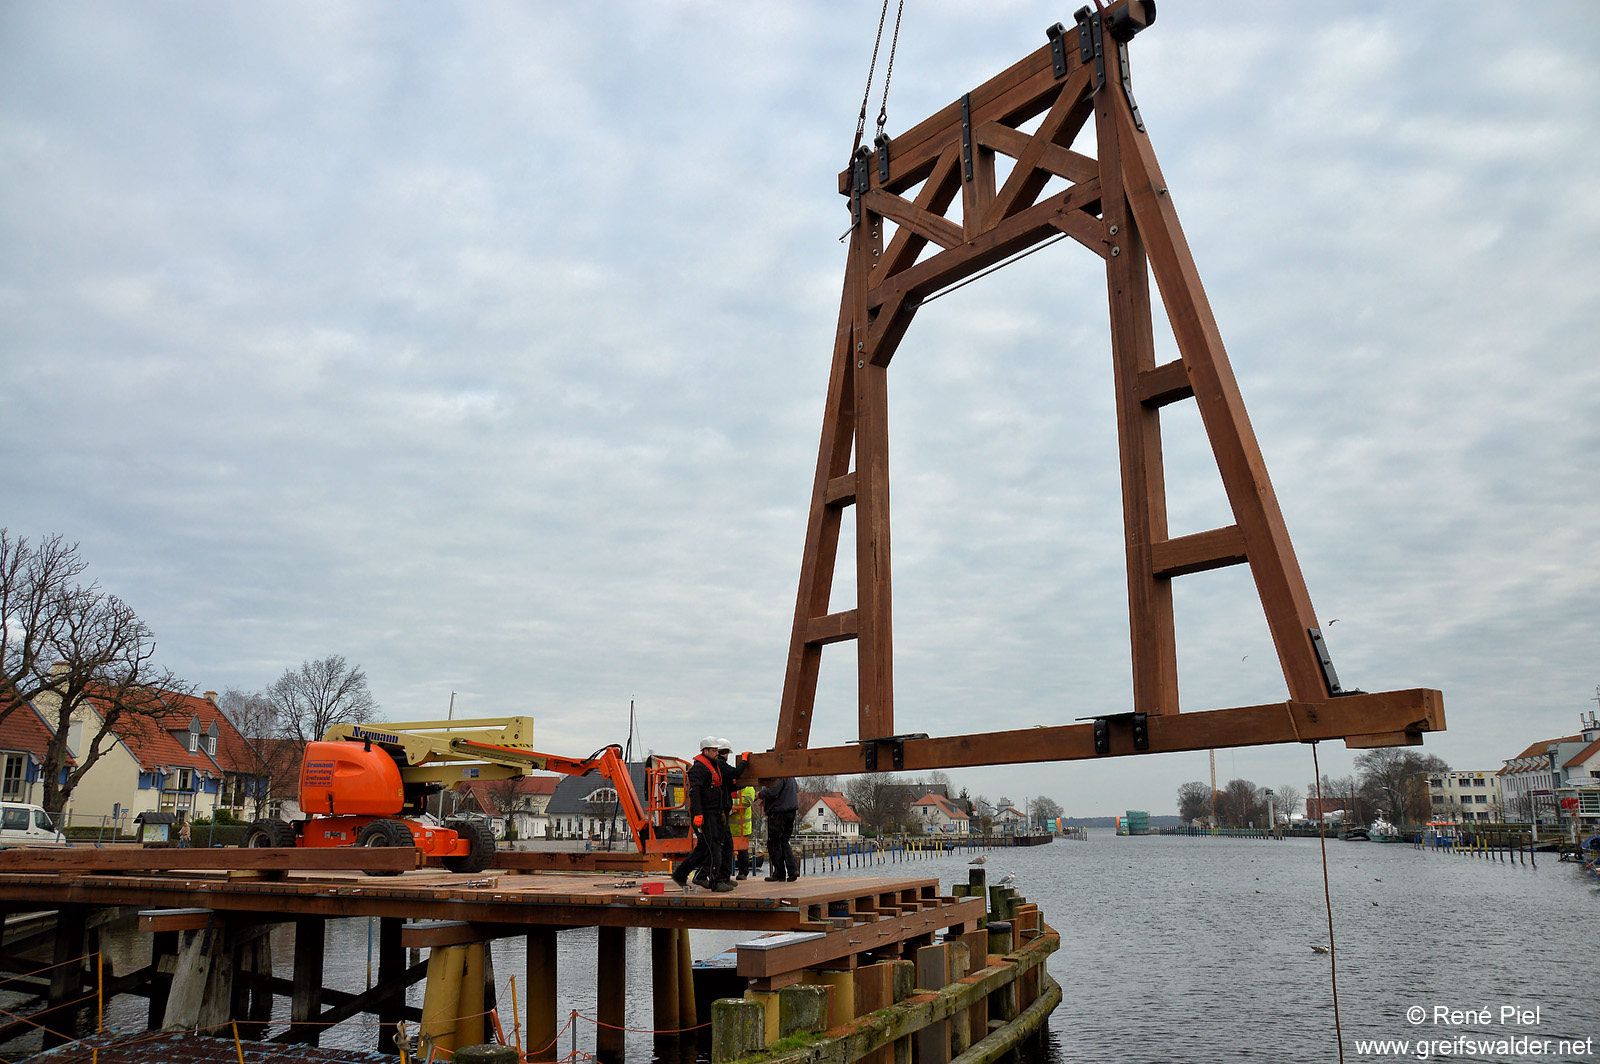 Wiederaufbau der Brücke in Greifswald-Wieck